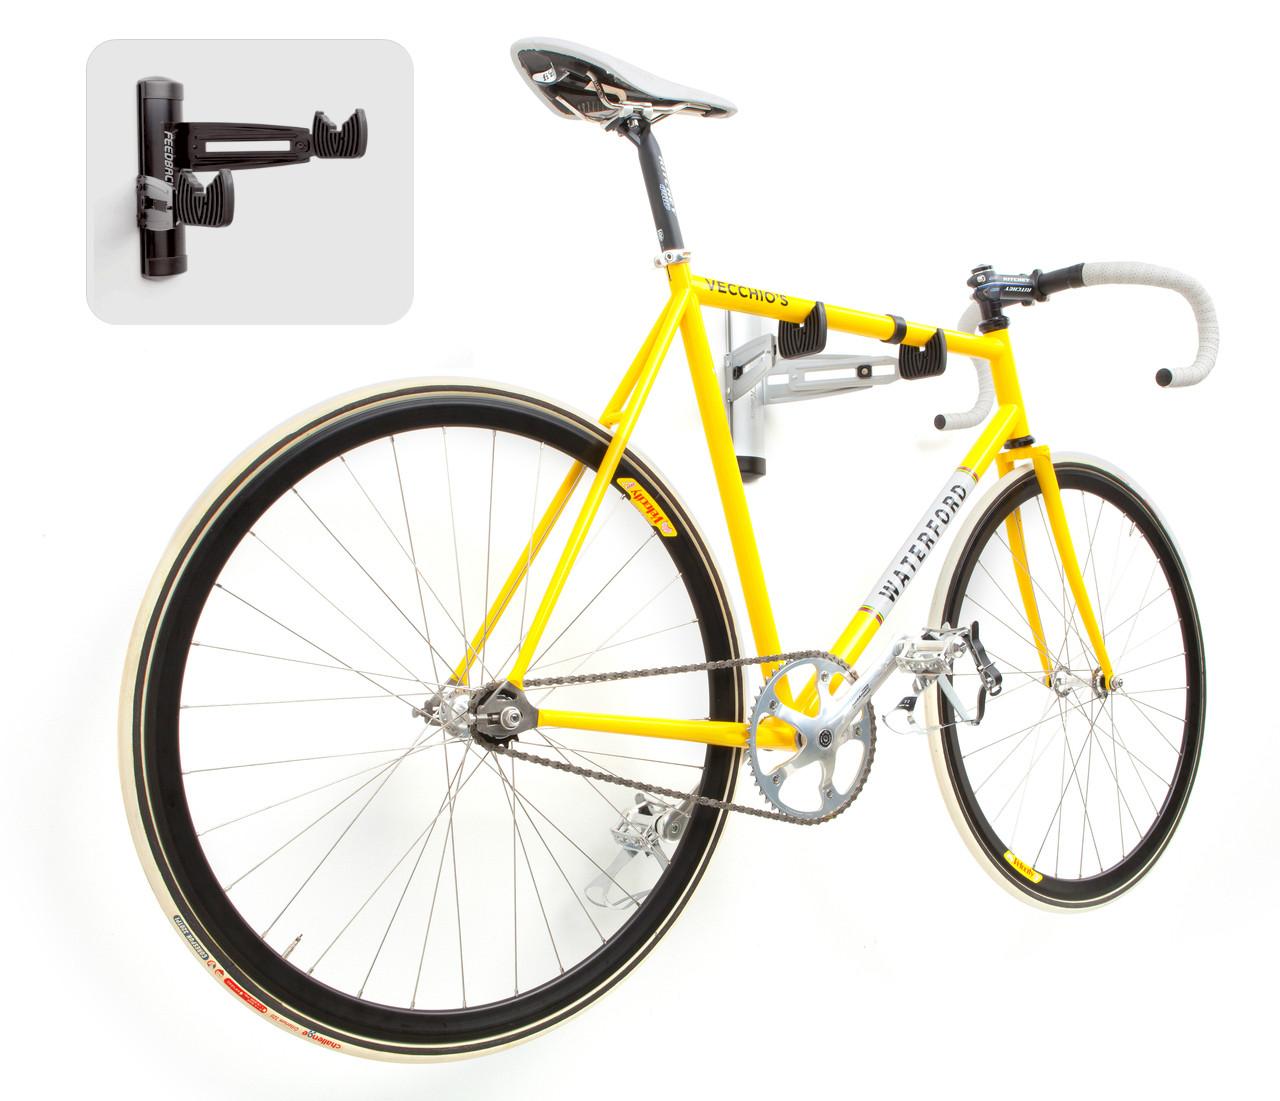 Beau Adjustable Home Bike Storage Rack